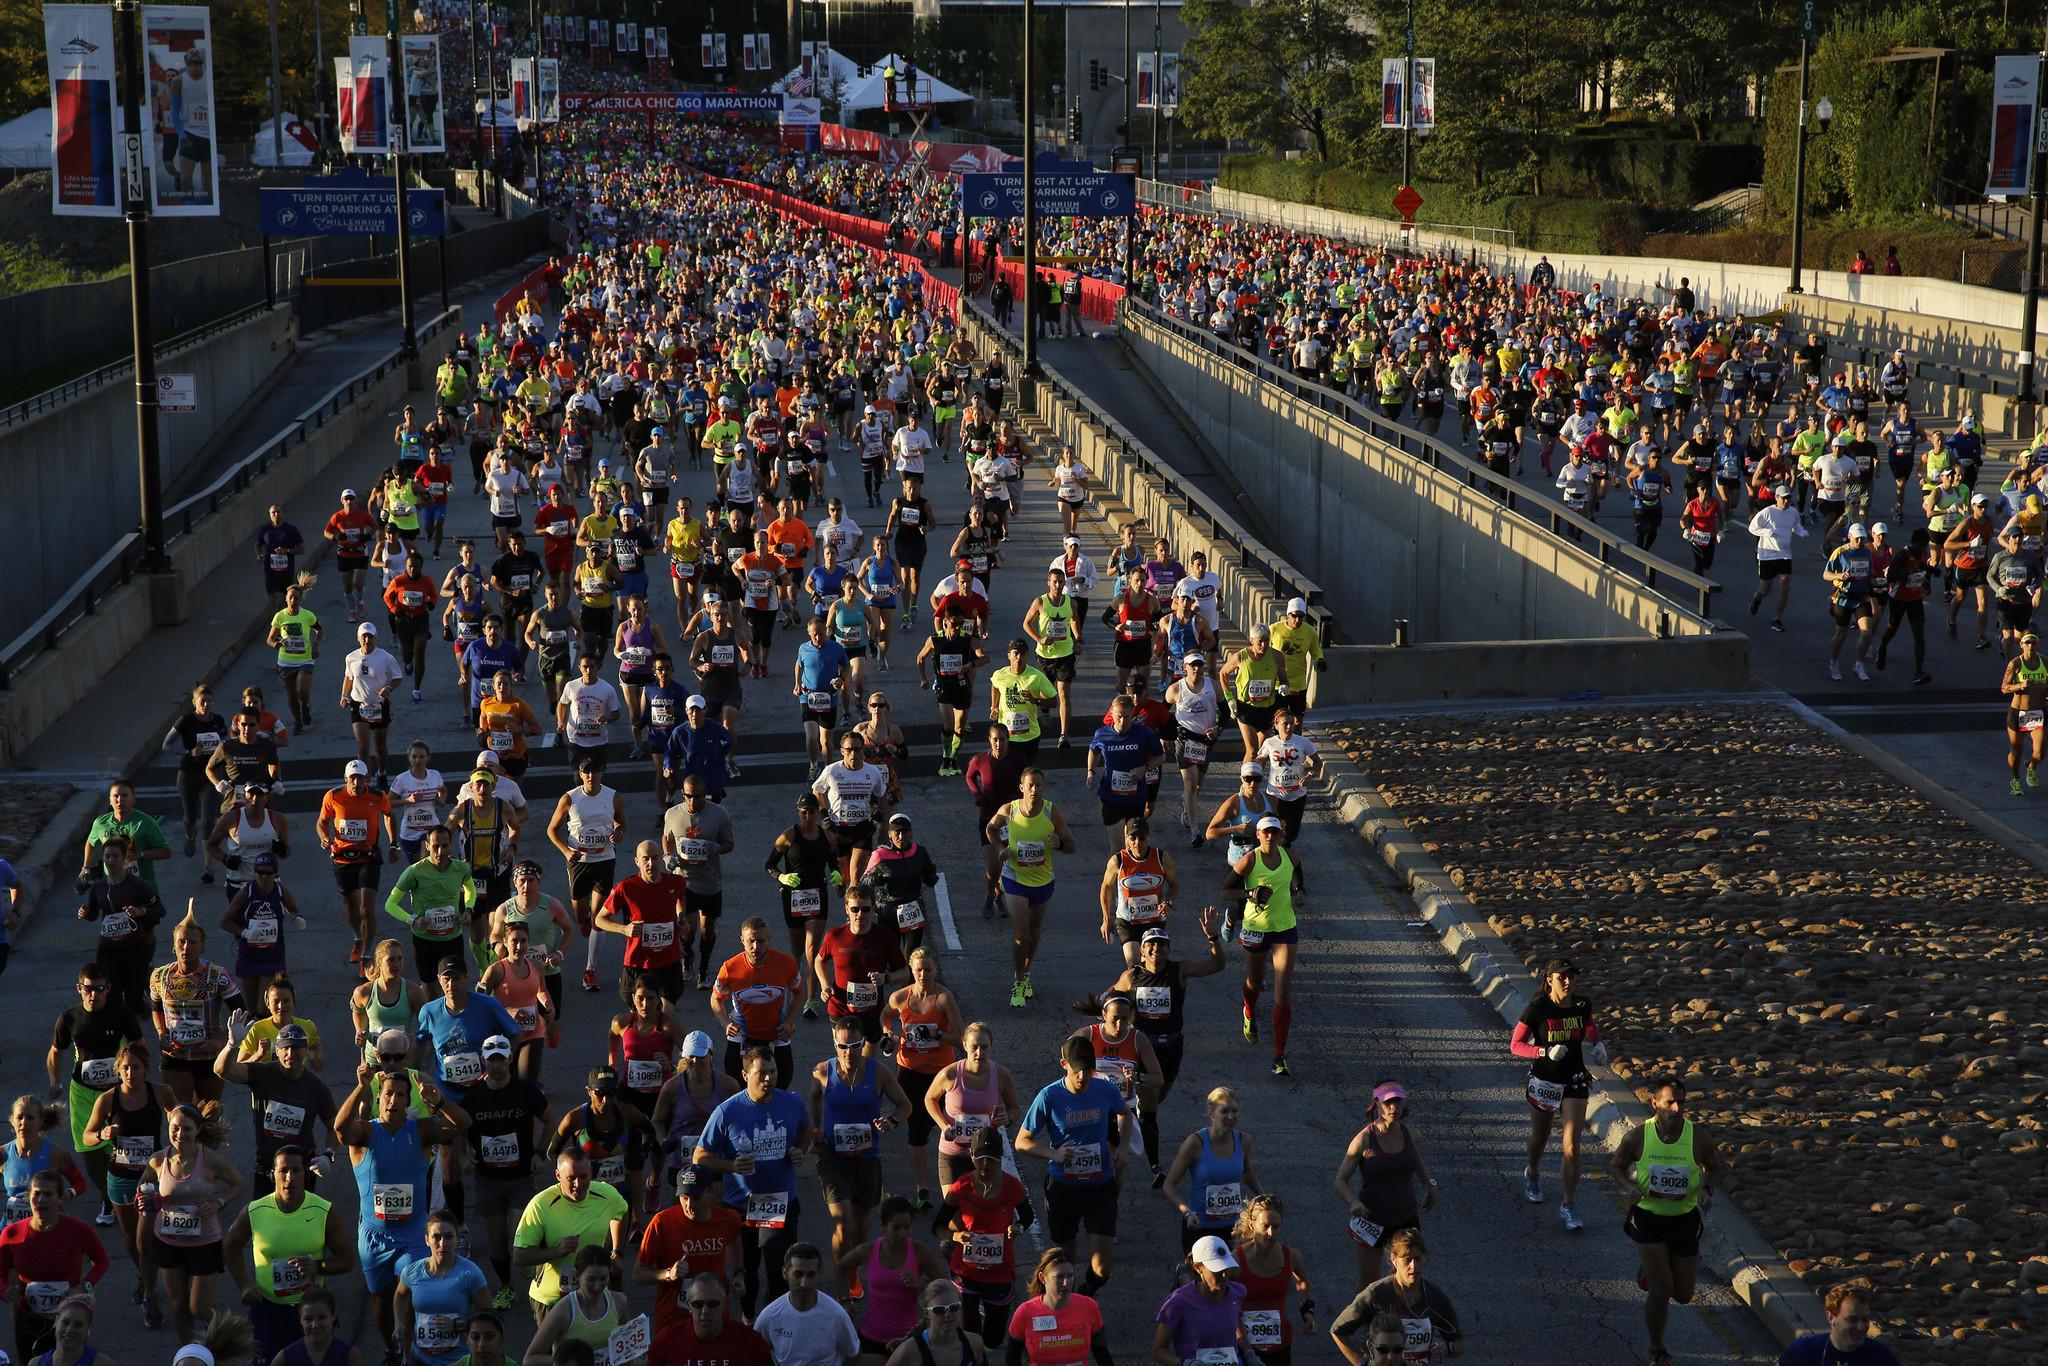 The start of the 2013 Bank of America Chicago Marathon on Sunday, Oct. 13, 2013.